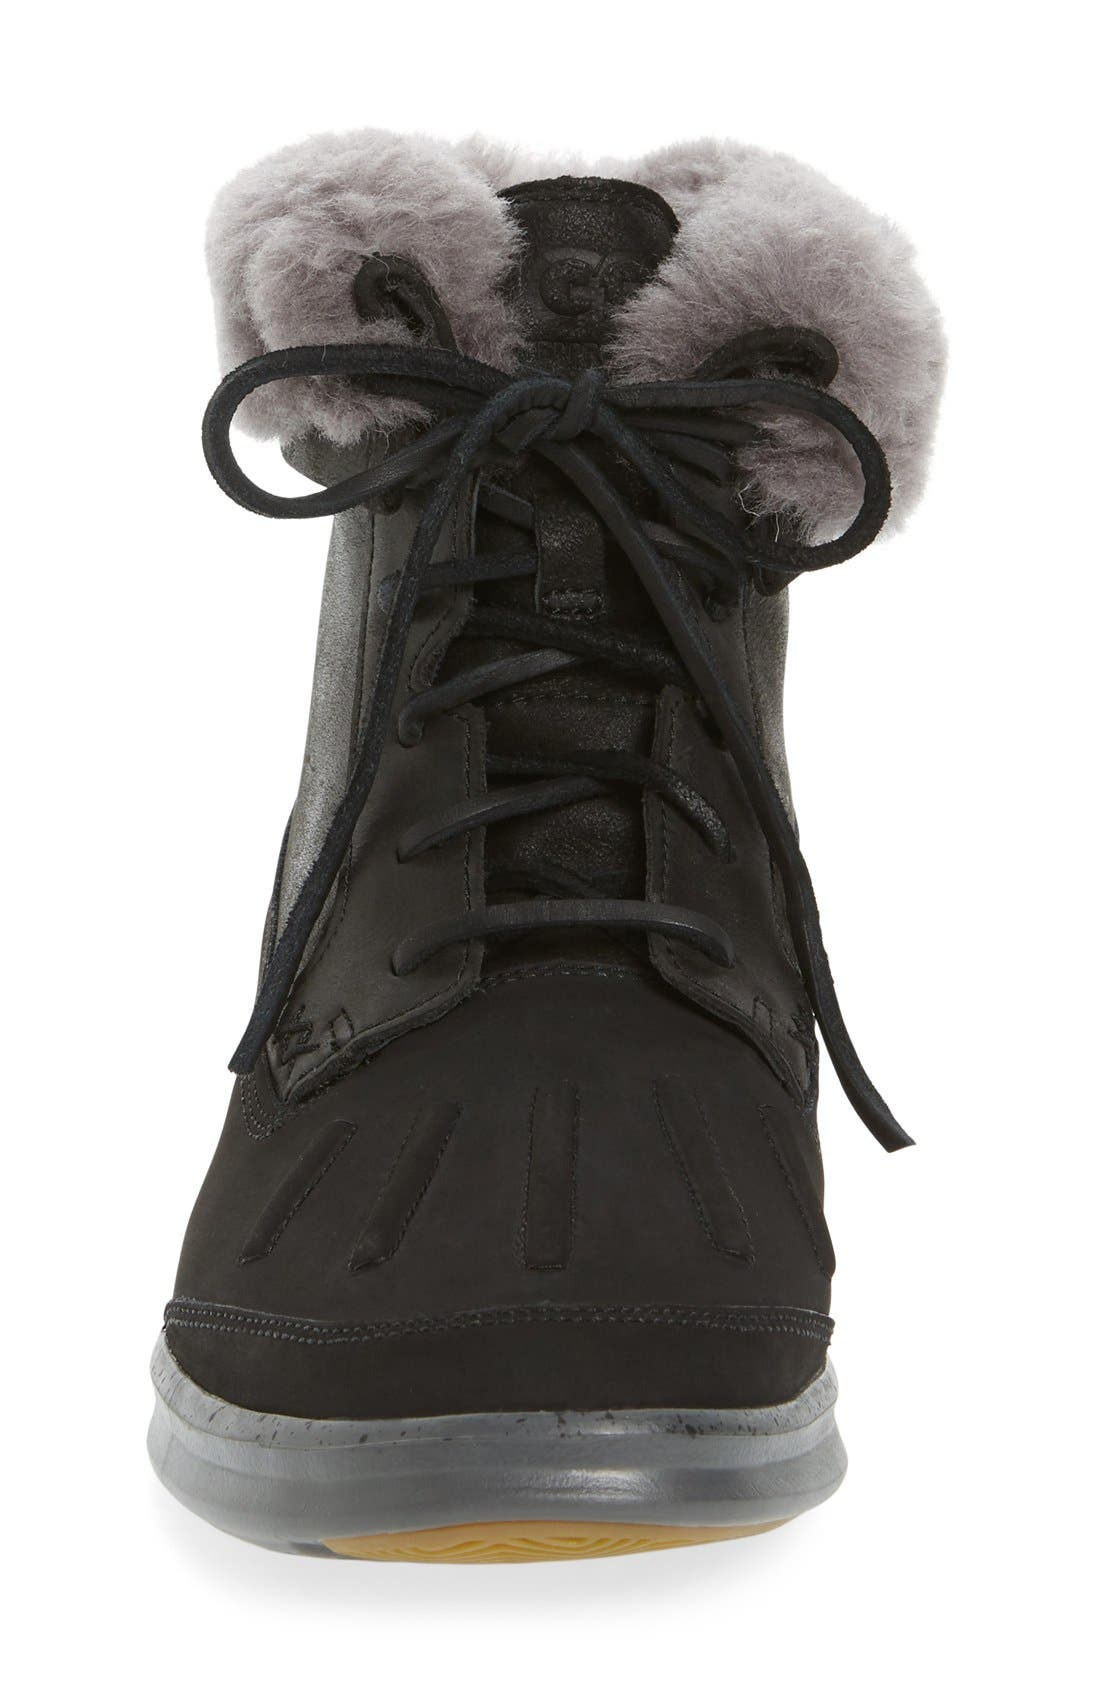 Roskoe Snow Boot,                             Alternate thumbnail 3, color,                             Black